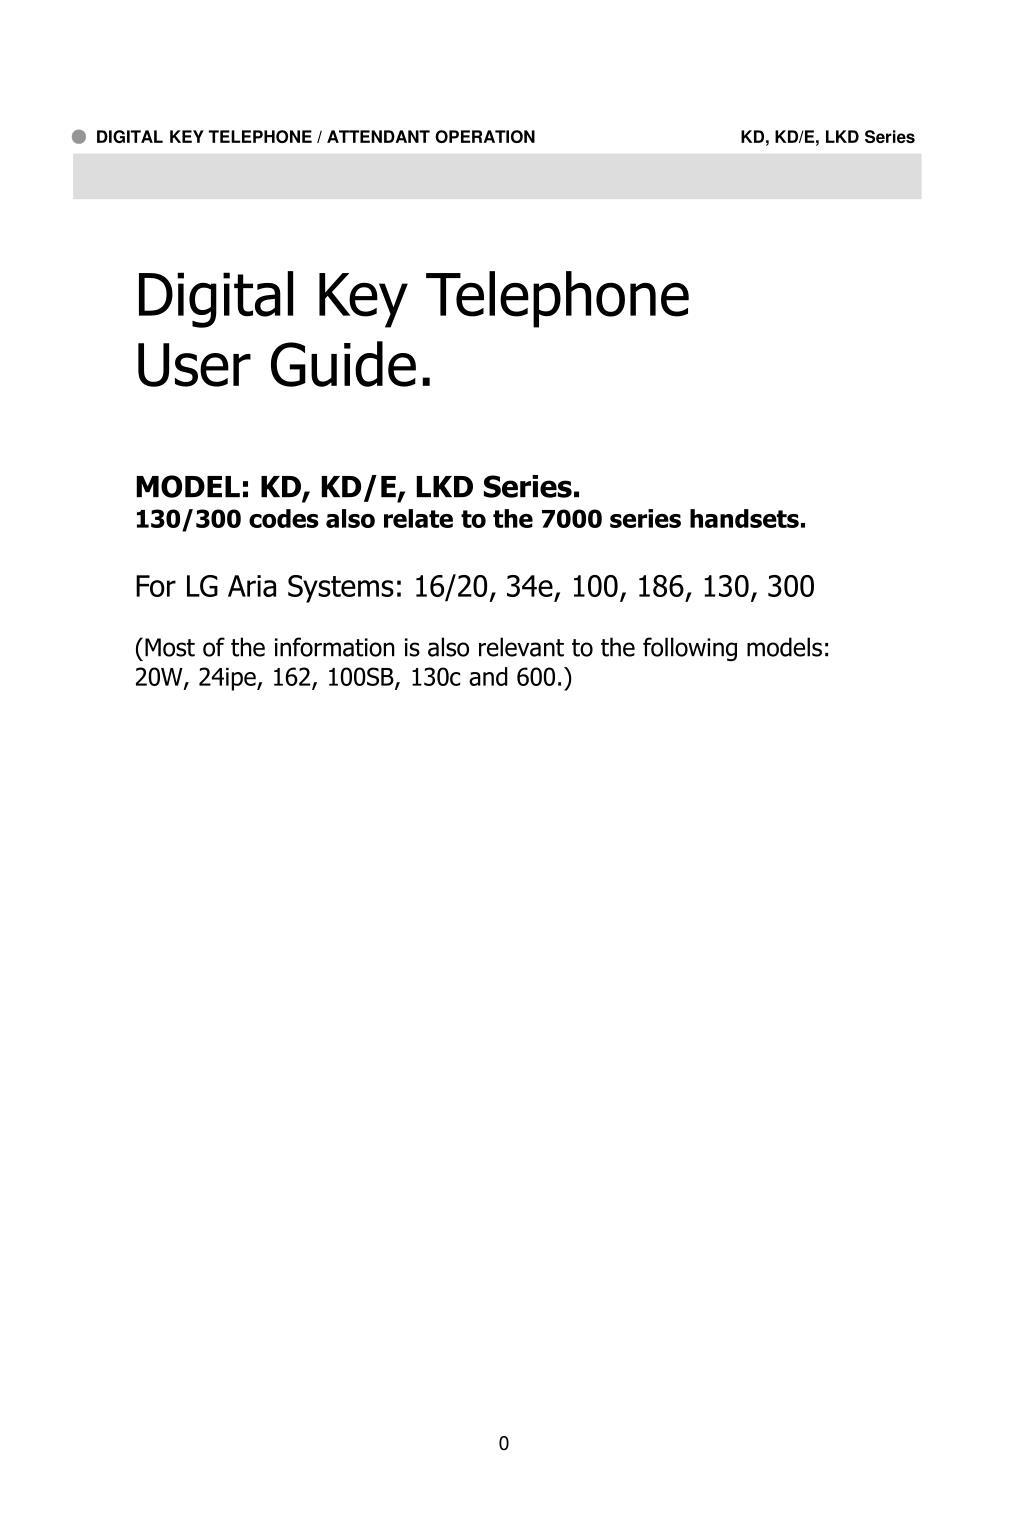 Digital Key Telephone